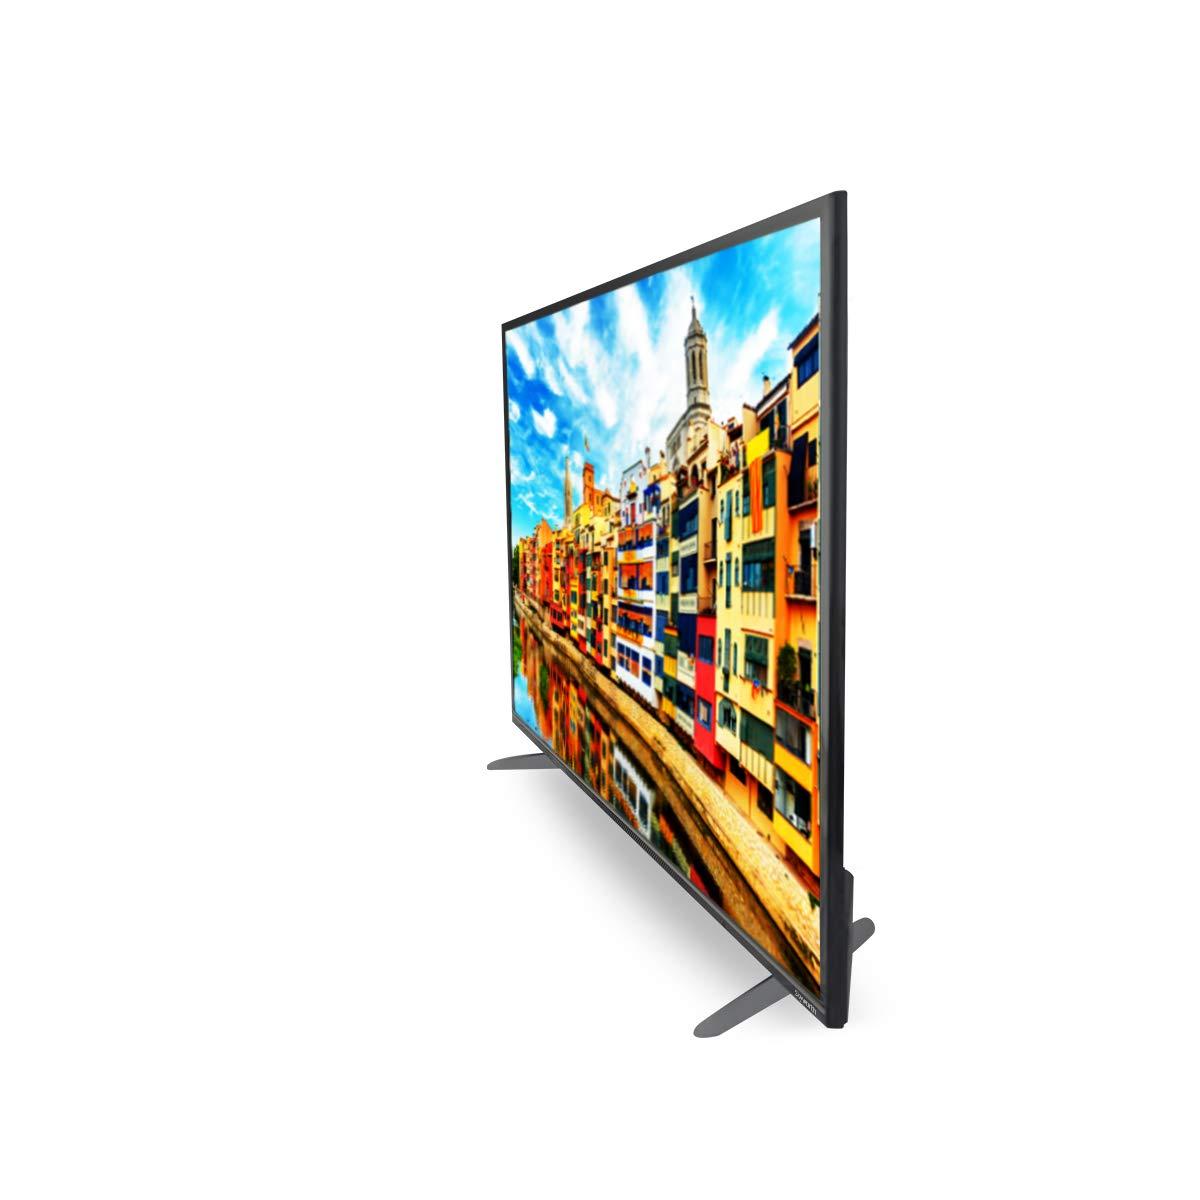 Skyworth LED TVs India - Skyworth 124.5 cm (49 inches) Smart 49 M20 Full HD LED Smart TV